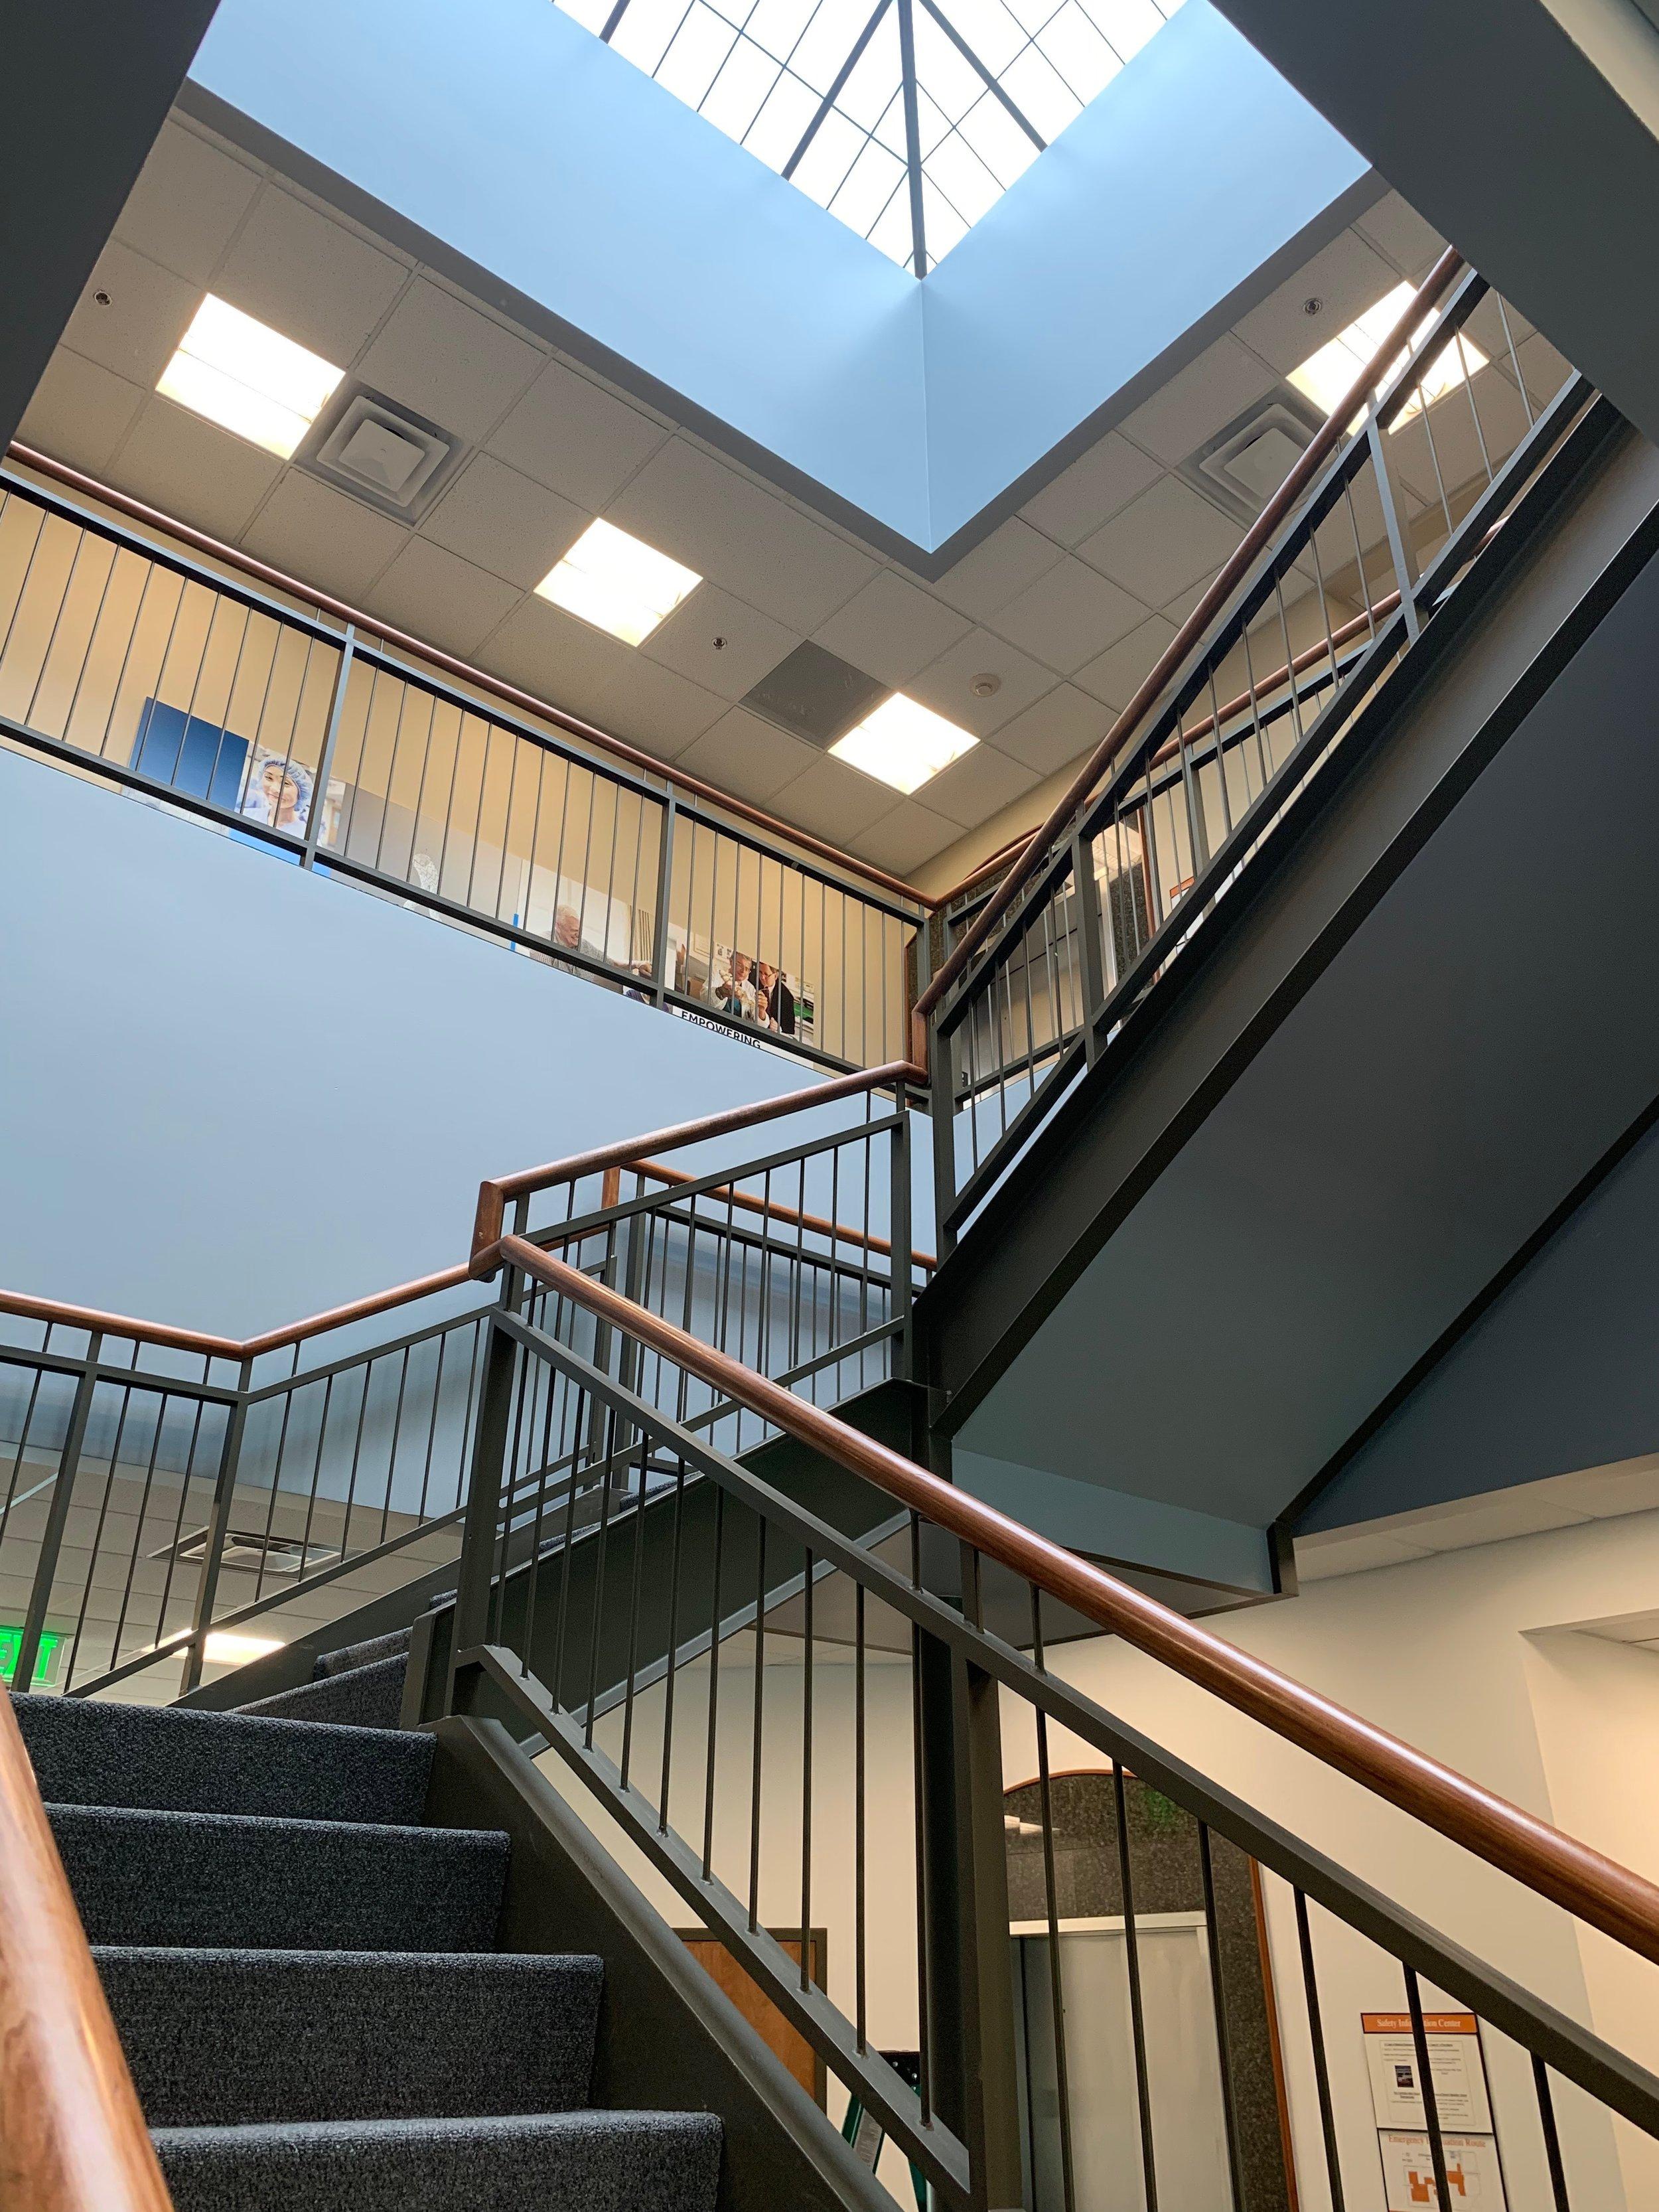 medtronic building threecore stairwell 4-27-19 #6.JPG